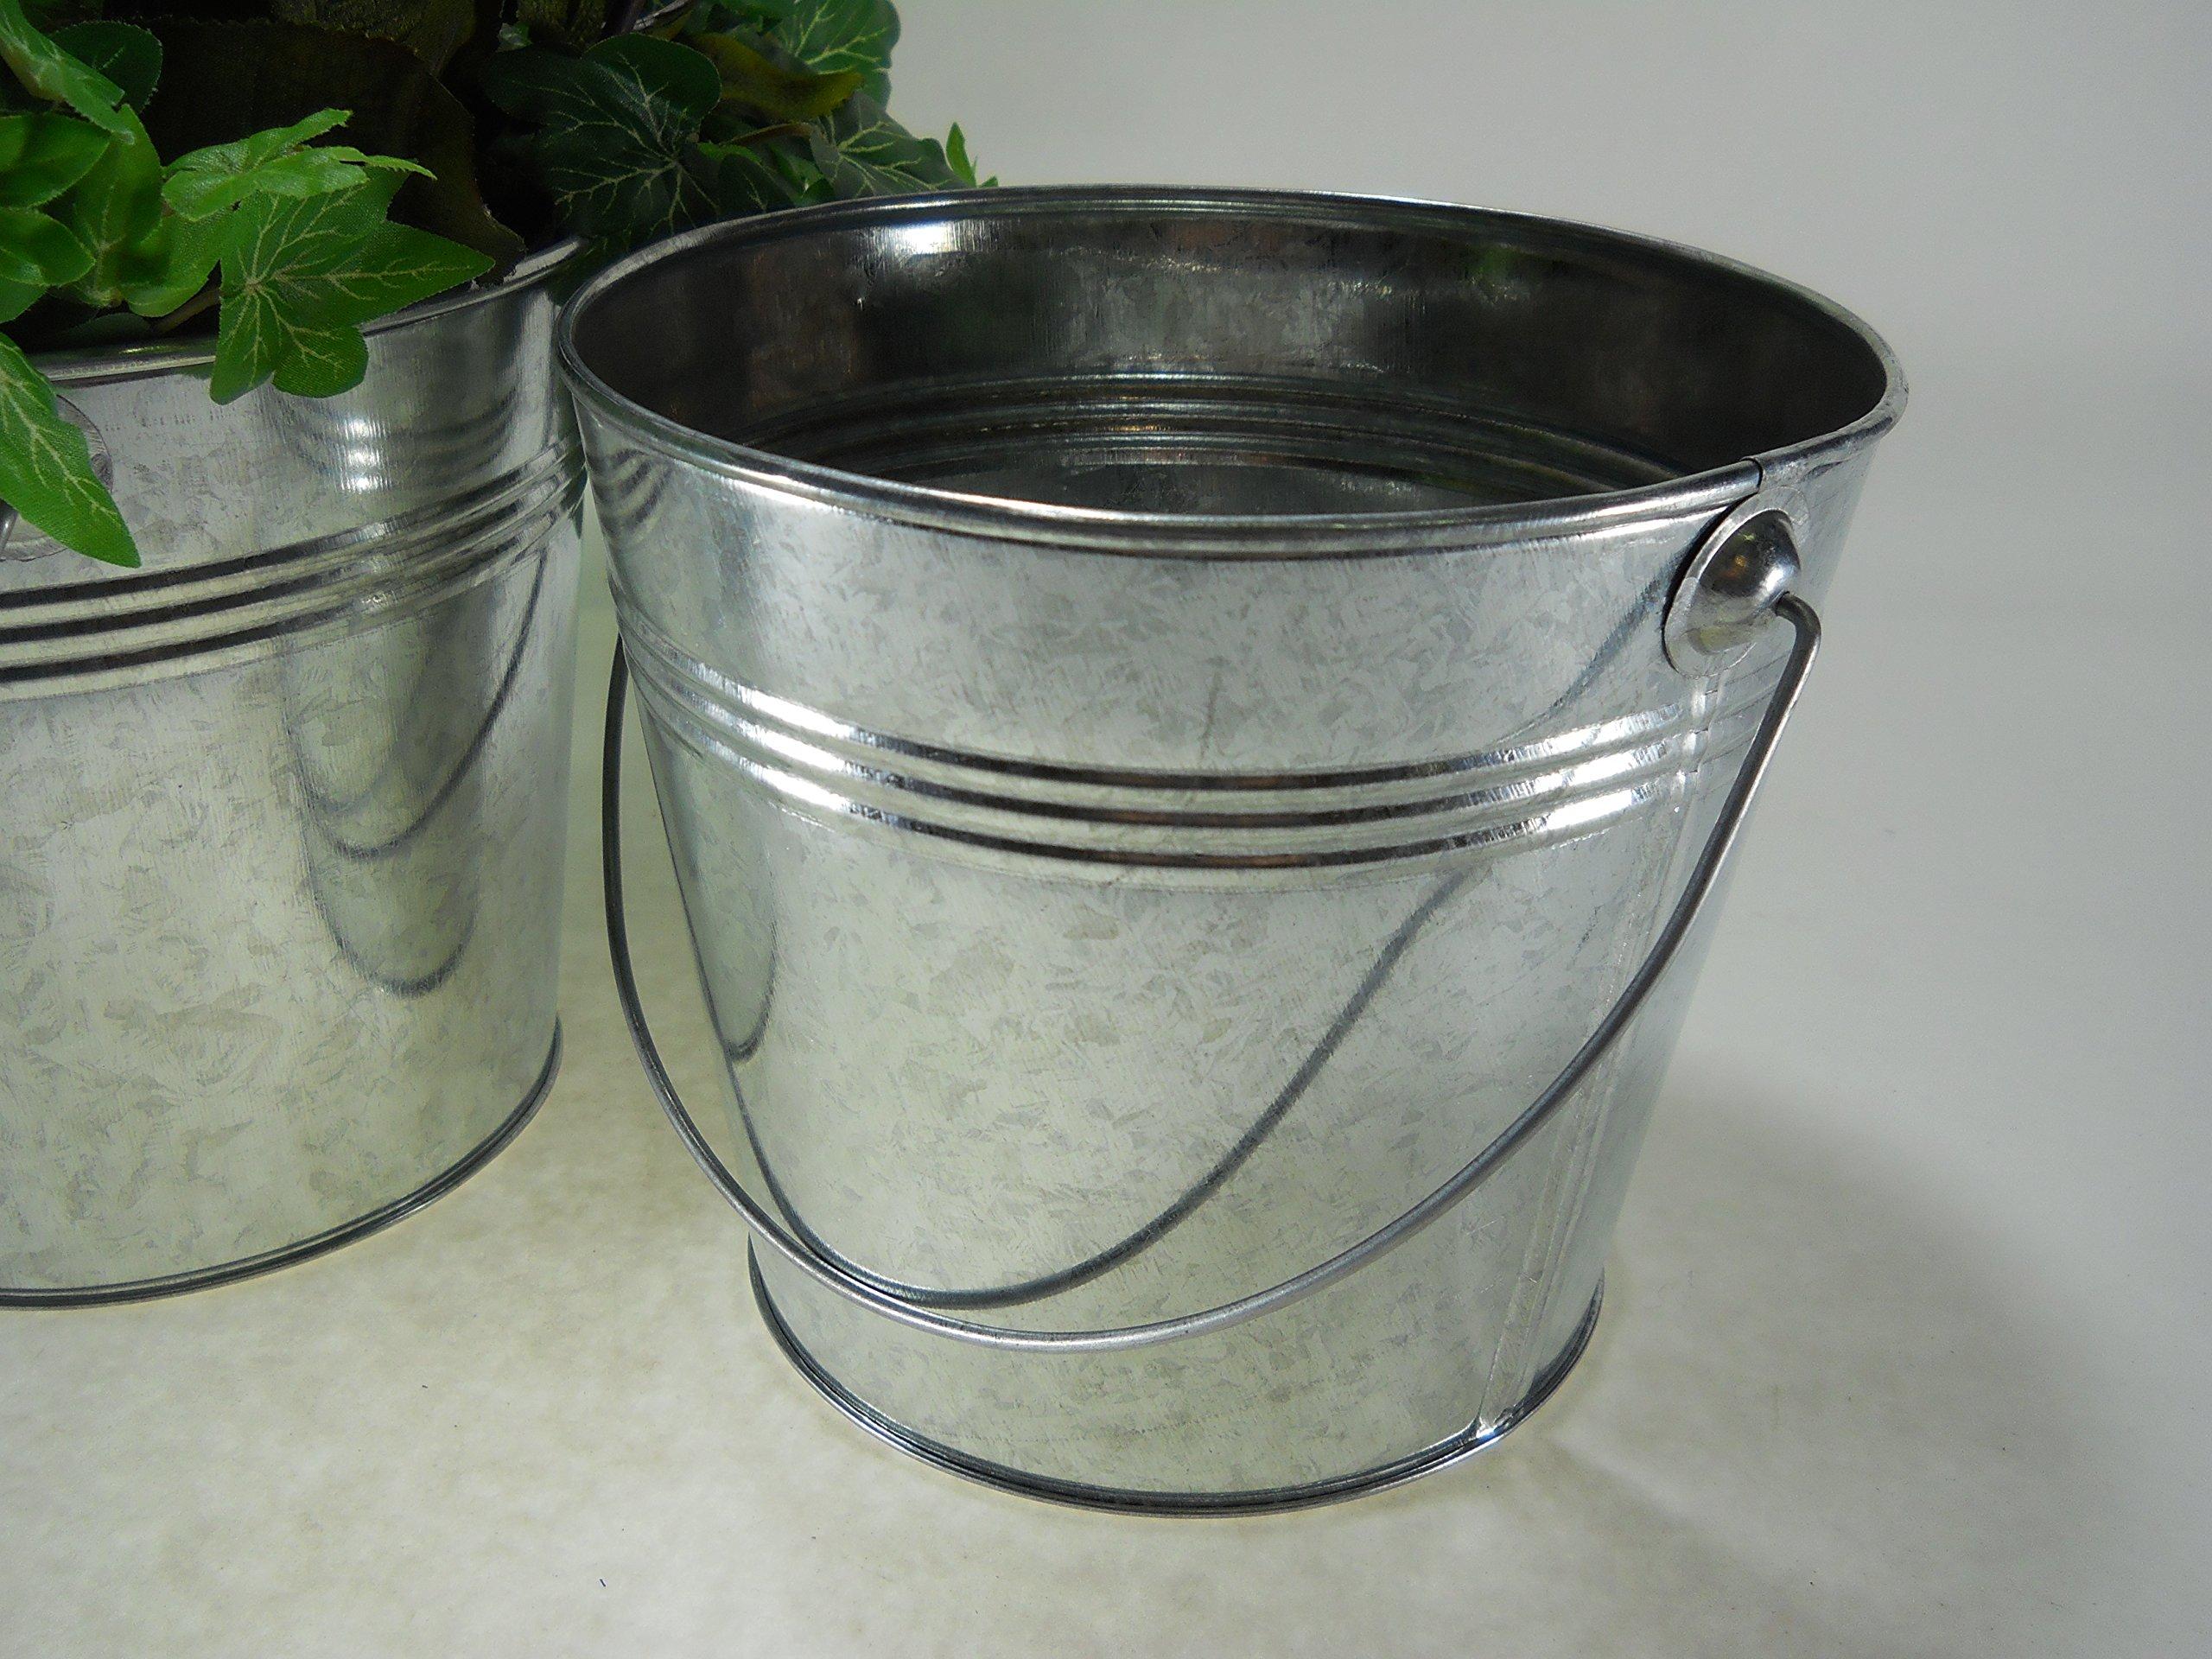 3 pc set 5 1/2'' Tall 2 Qt Galvanized Pail/bucket with ridges